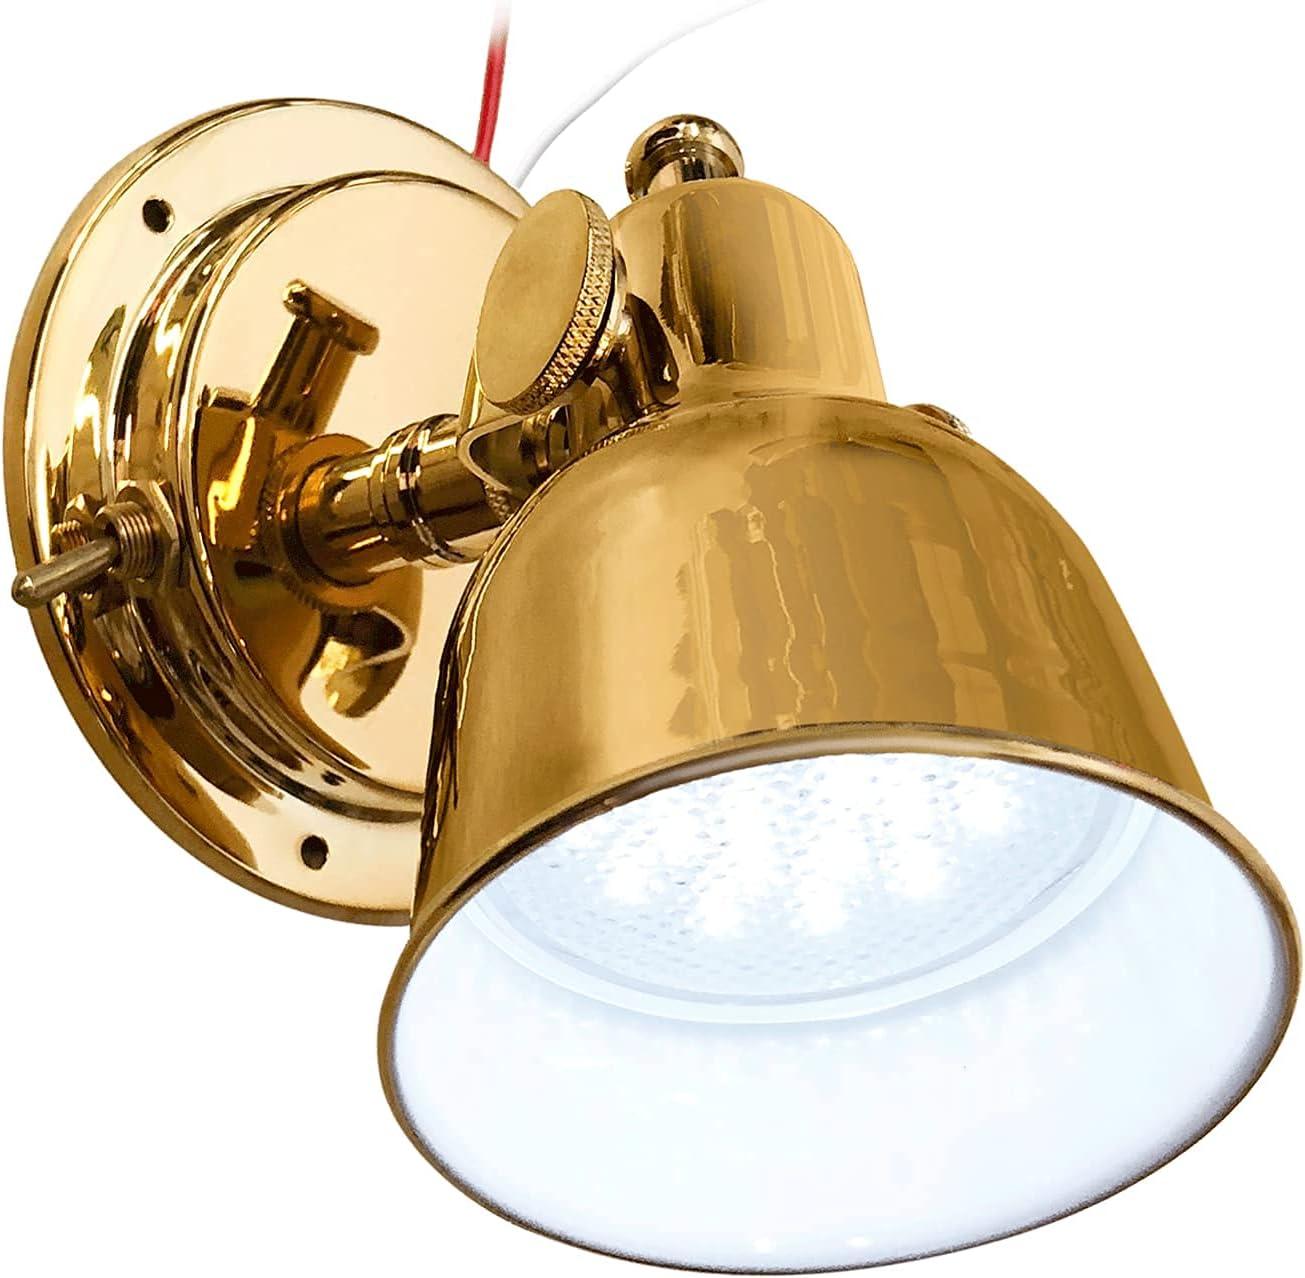 ADVANCED LED TiN Polished Department store Brass Bulkhead Berth Light Complete Free Shipping Finish Ef